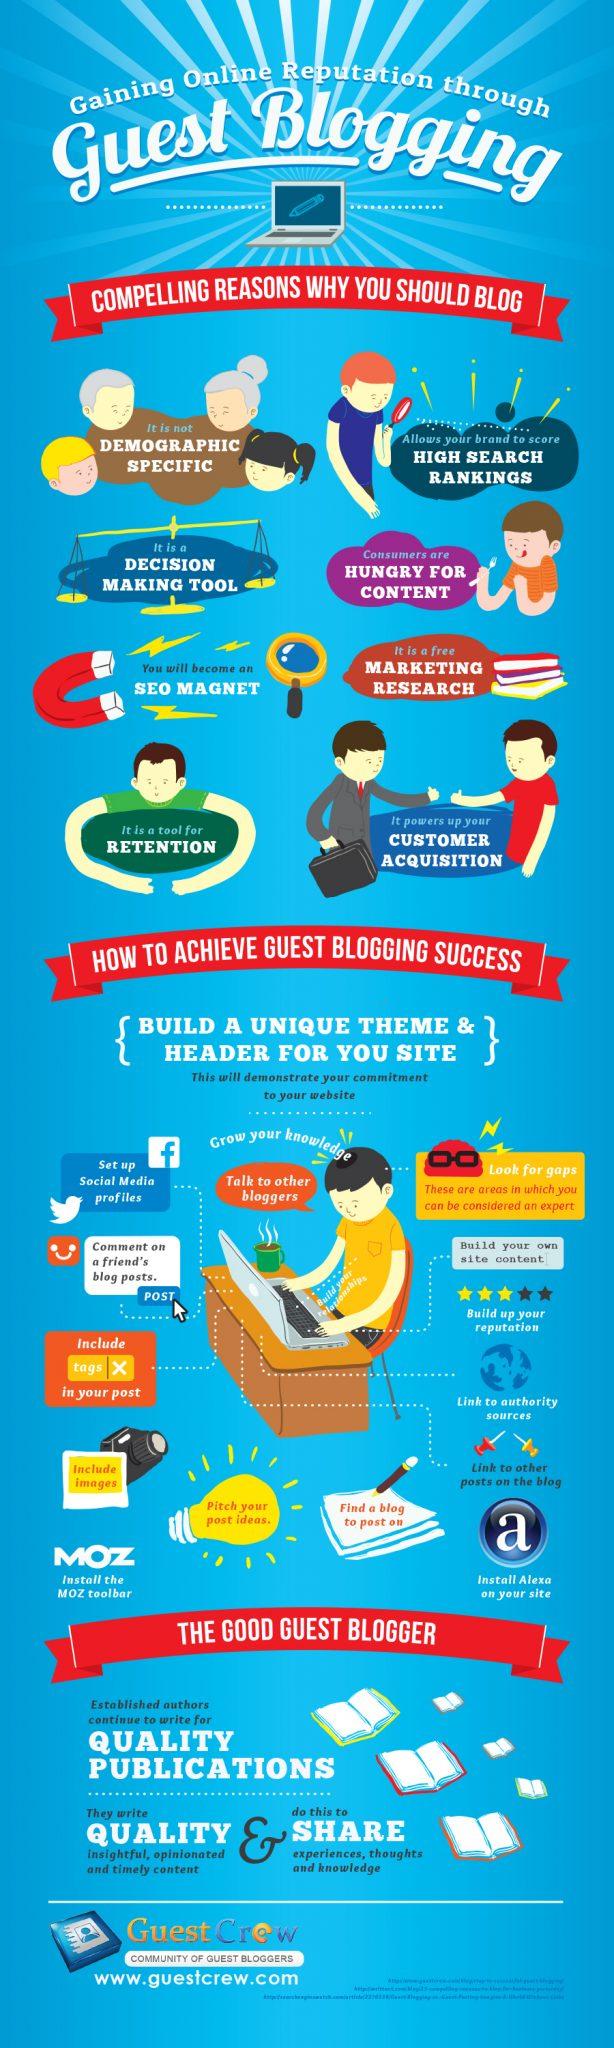 Gain Backlinks Through Guest Blogging